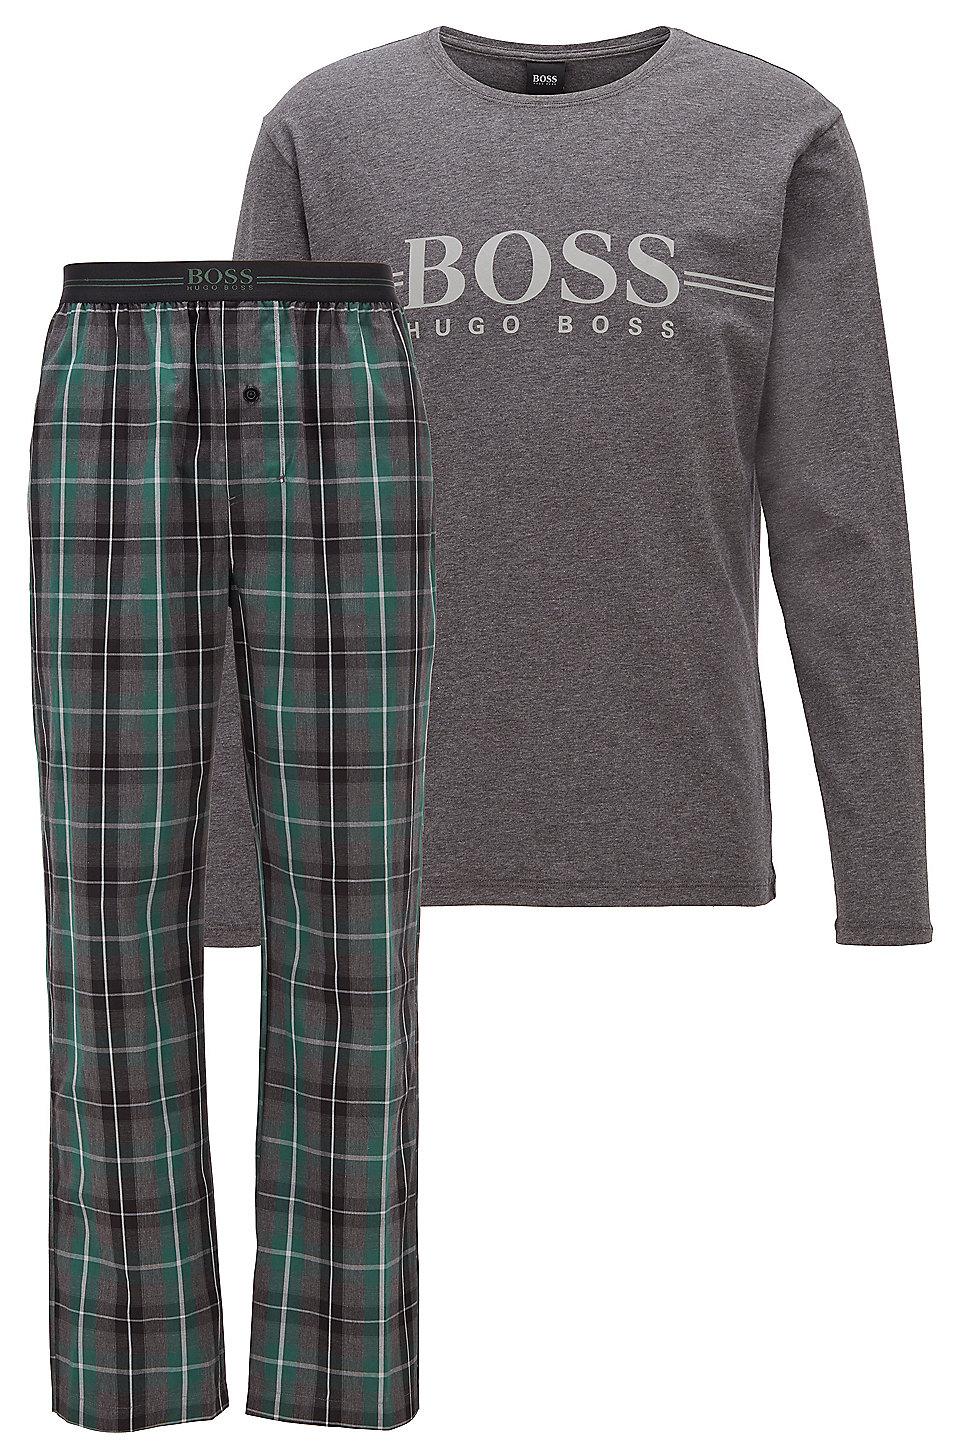 Hugo Boss Urban Long Pyjamas Set Check Navy 50414805